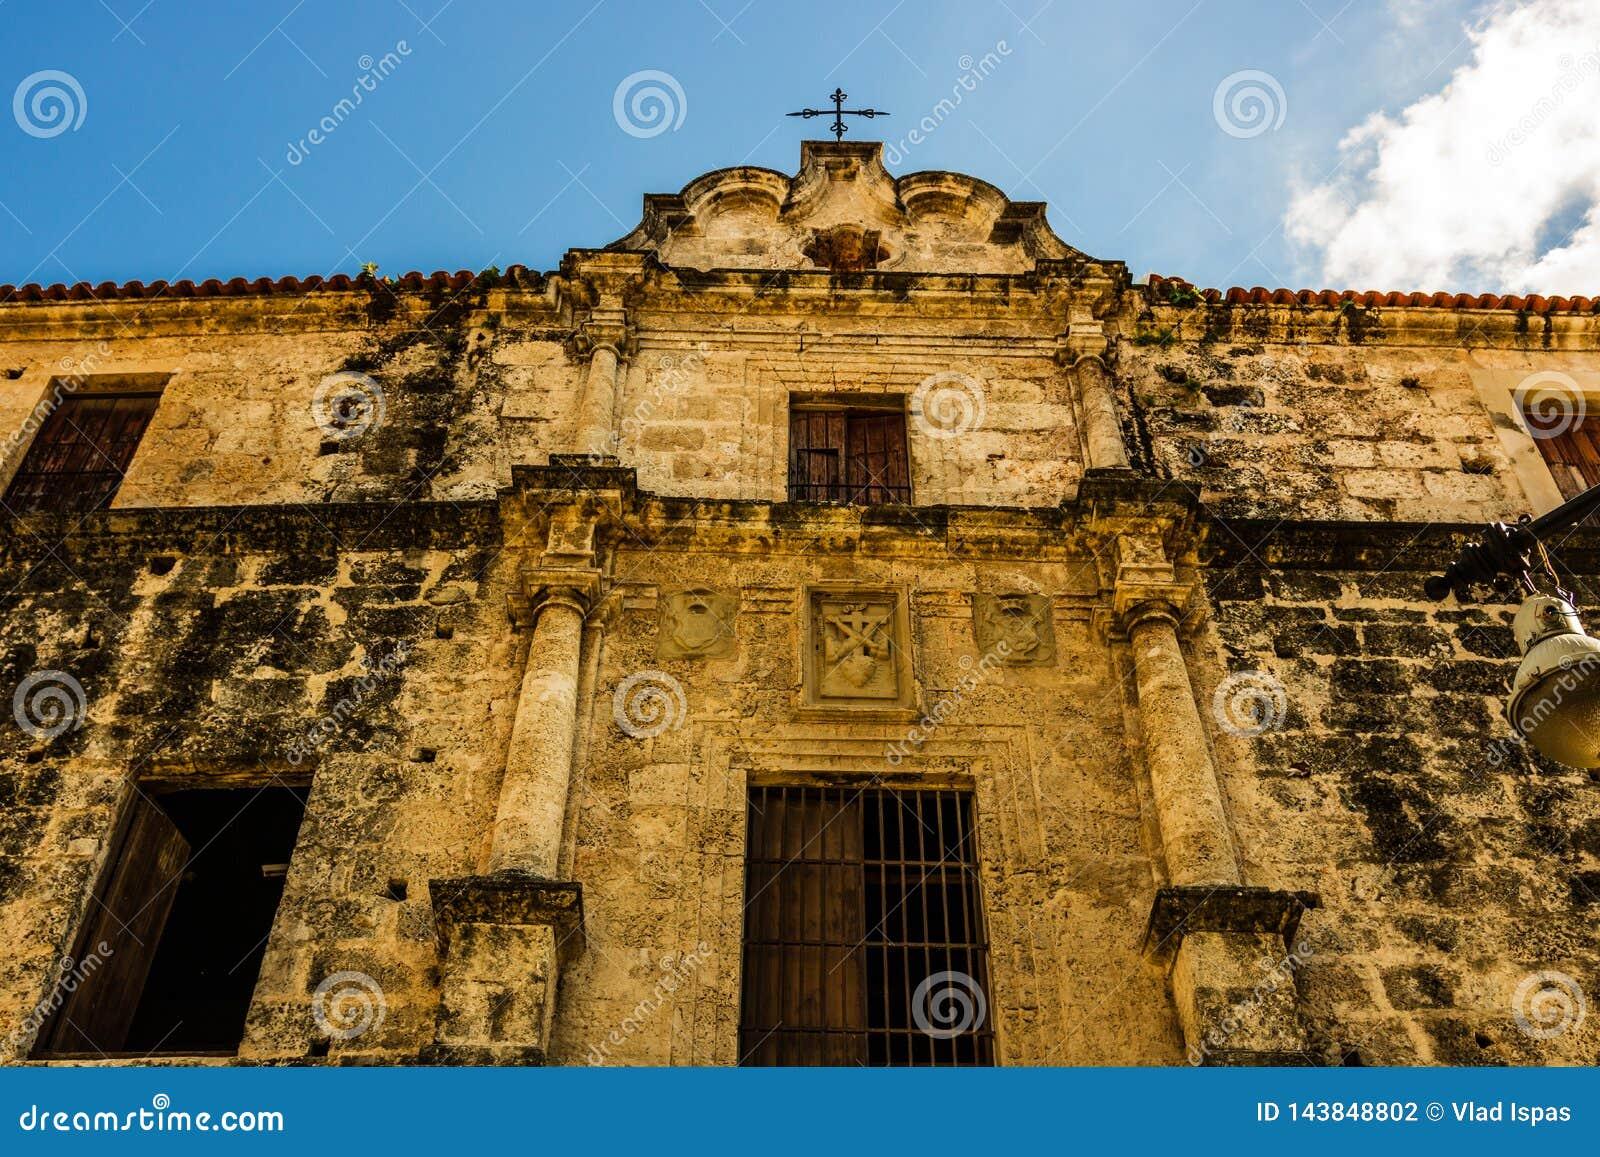 Facciata di vecchia cattedrale coloniale a vecchia Avana, Cuba